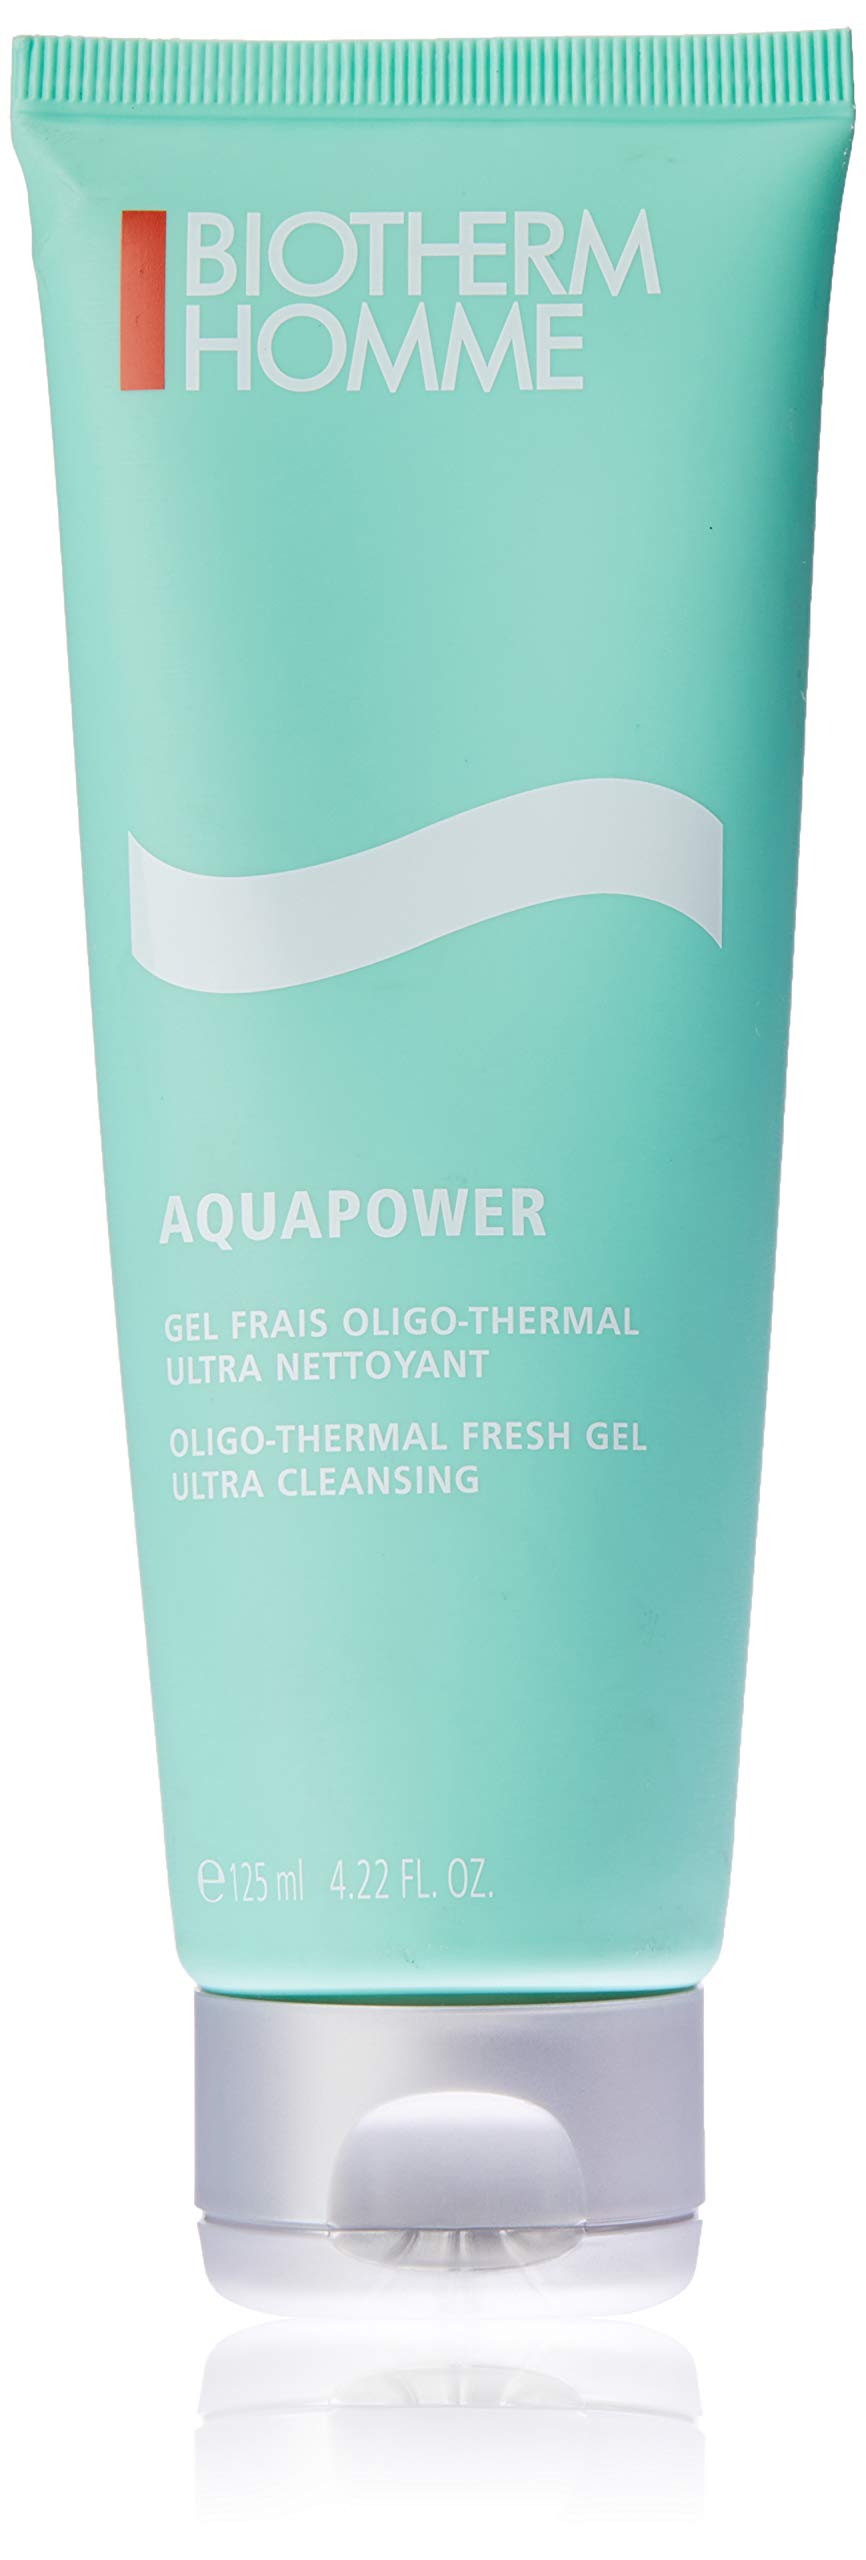 Biotherm Home Aqua Power Oligo-Thermal Fresh Ultra Cleansing Gel for Men, 4.22 Ounce